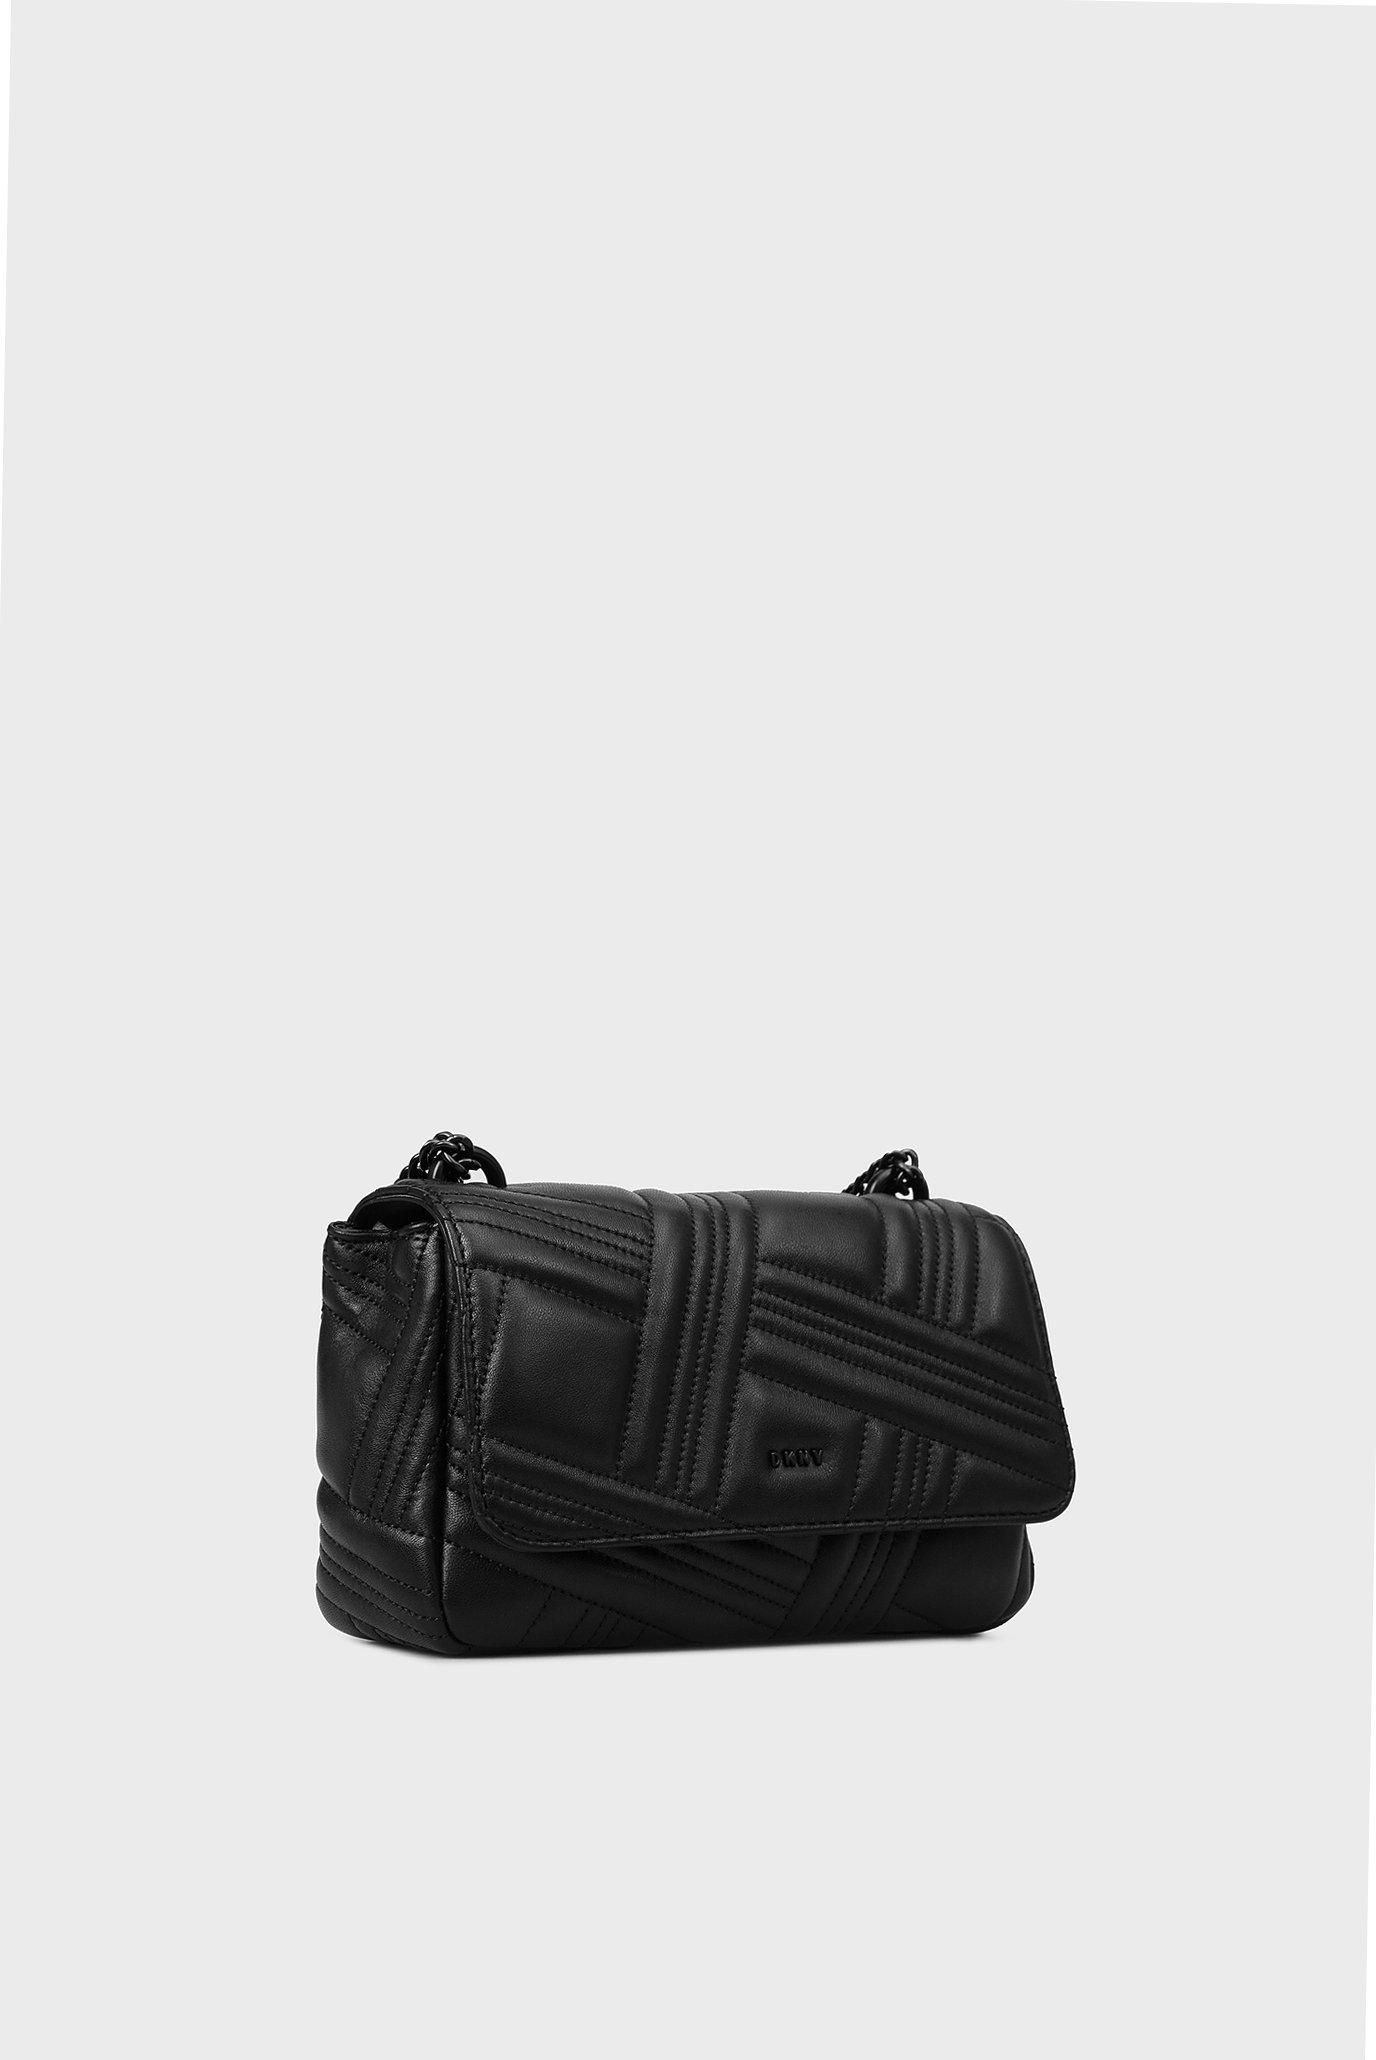 Купить Женская черная кожаная сумка через плечо DKNY DKNY R833B638 – Киев 310db5953ed06